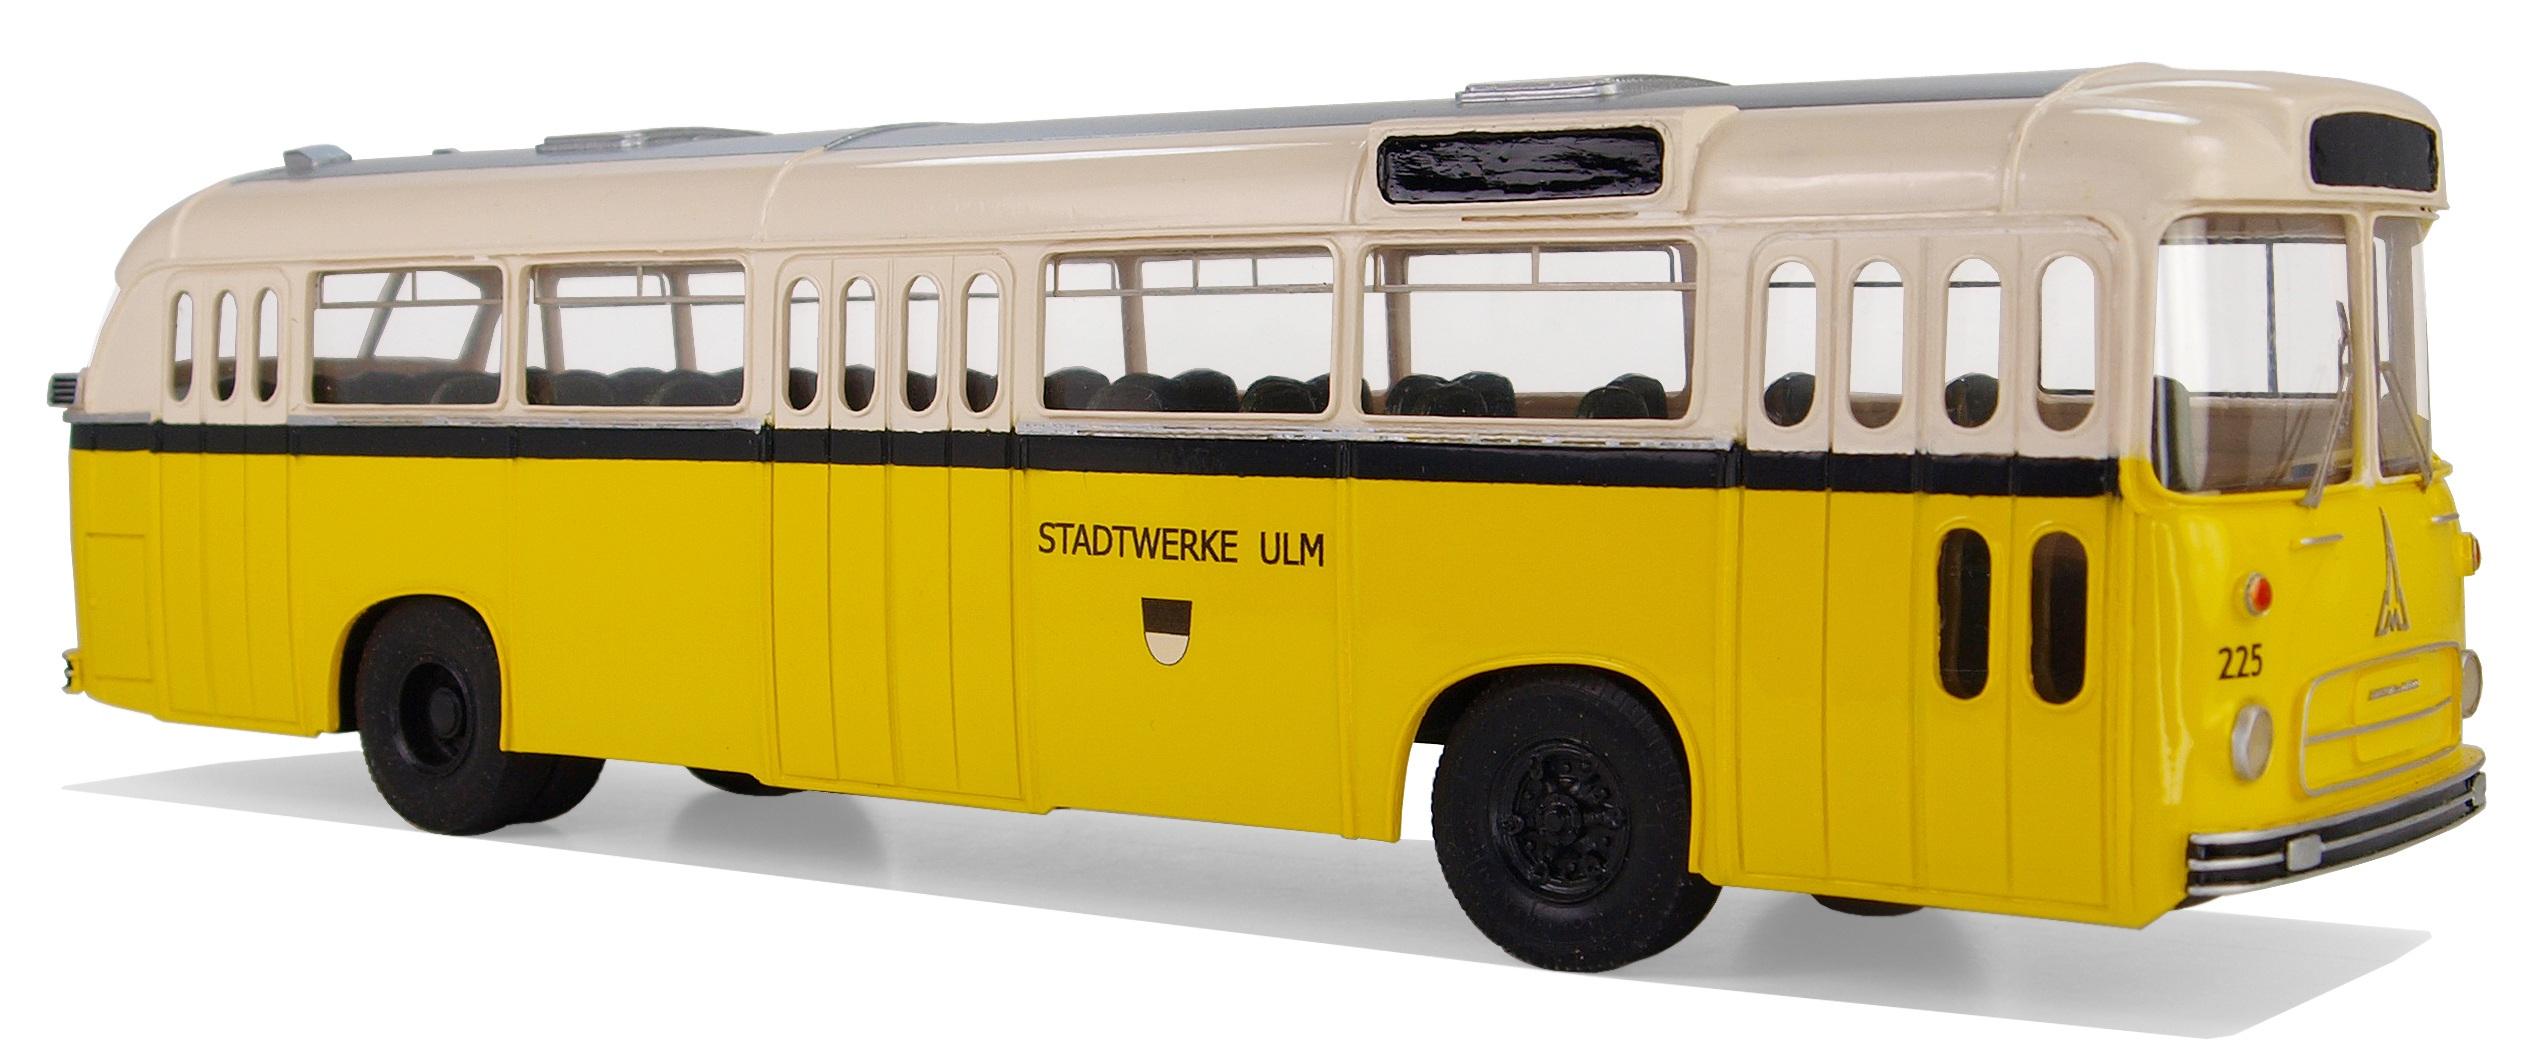 free images leisure city bus lines oldtimer trolleybus model buses model cars collect. Black Bedroom Furniture Sets. Home Design Ideas